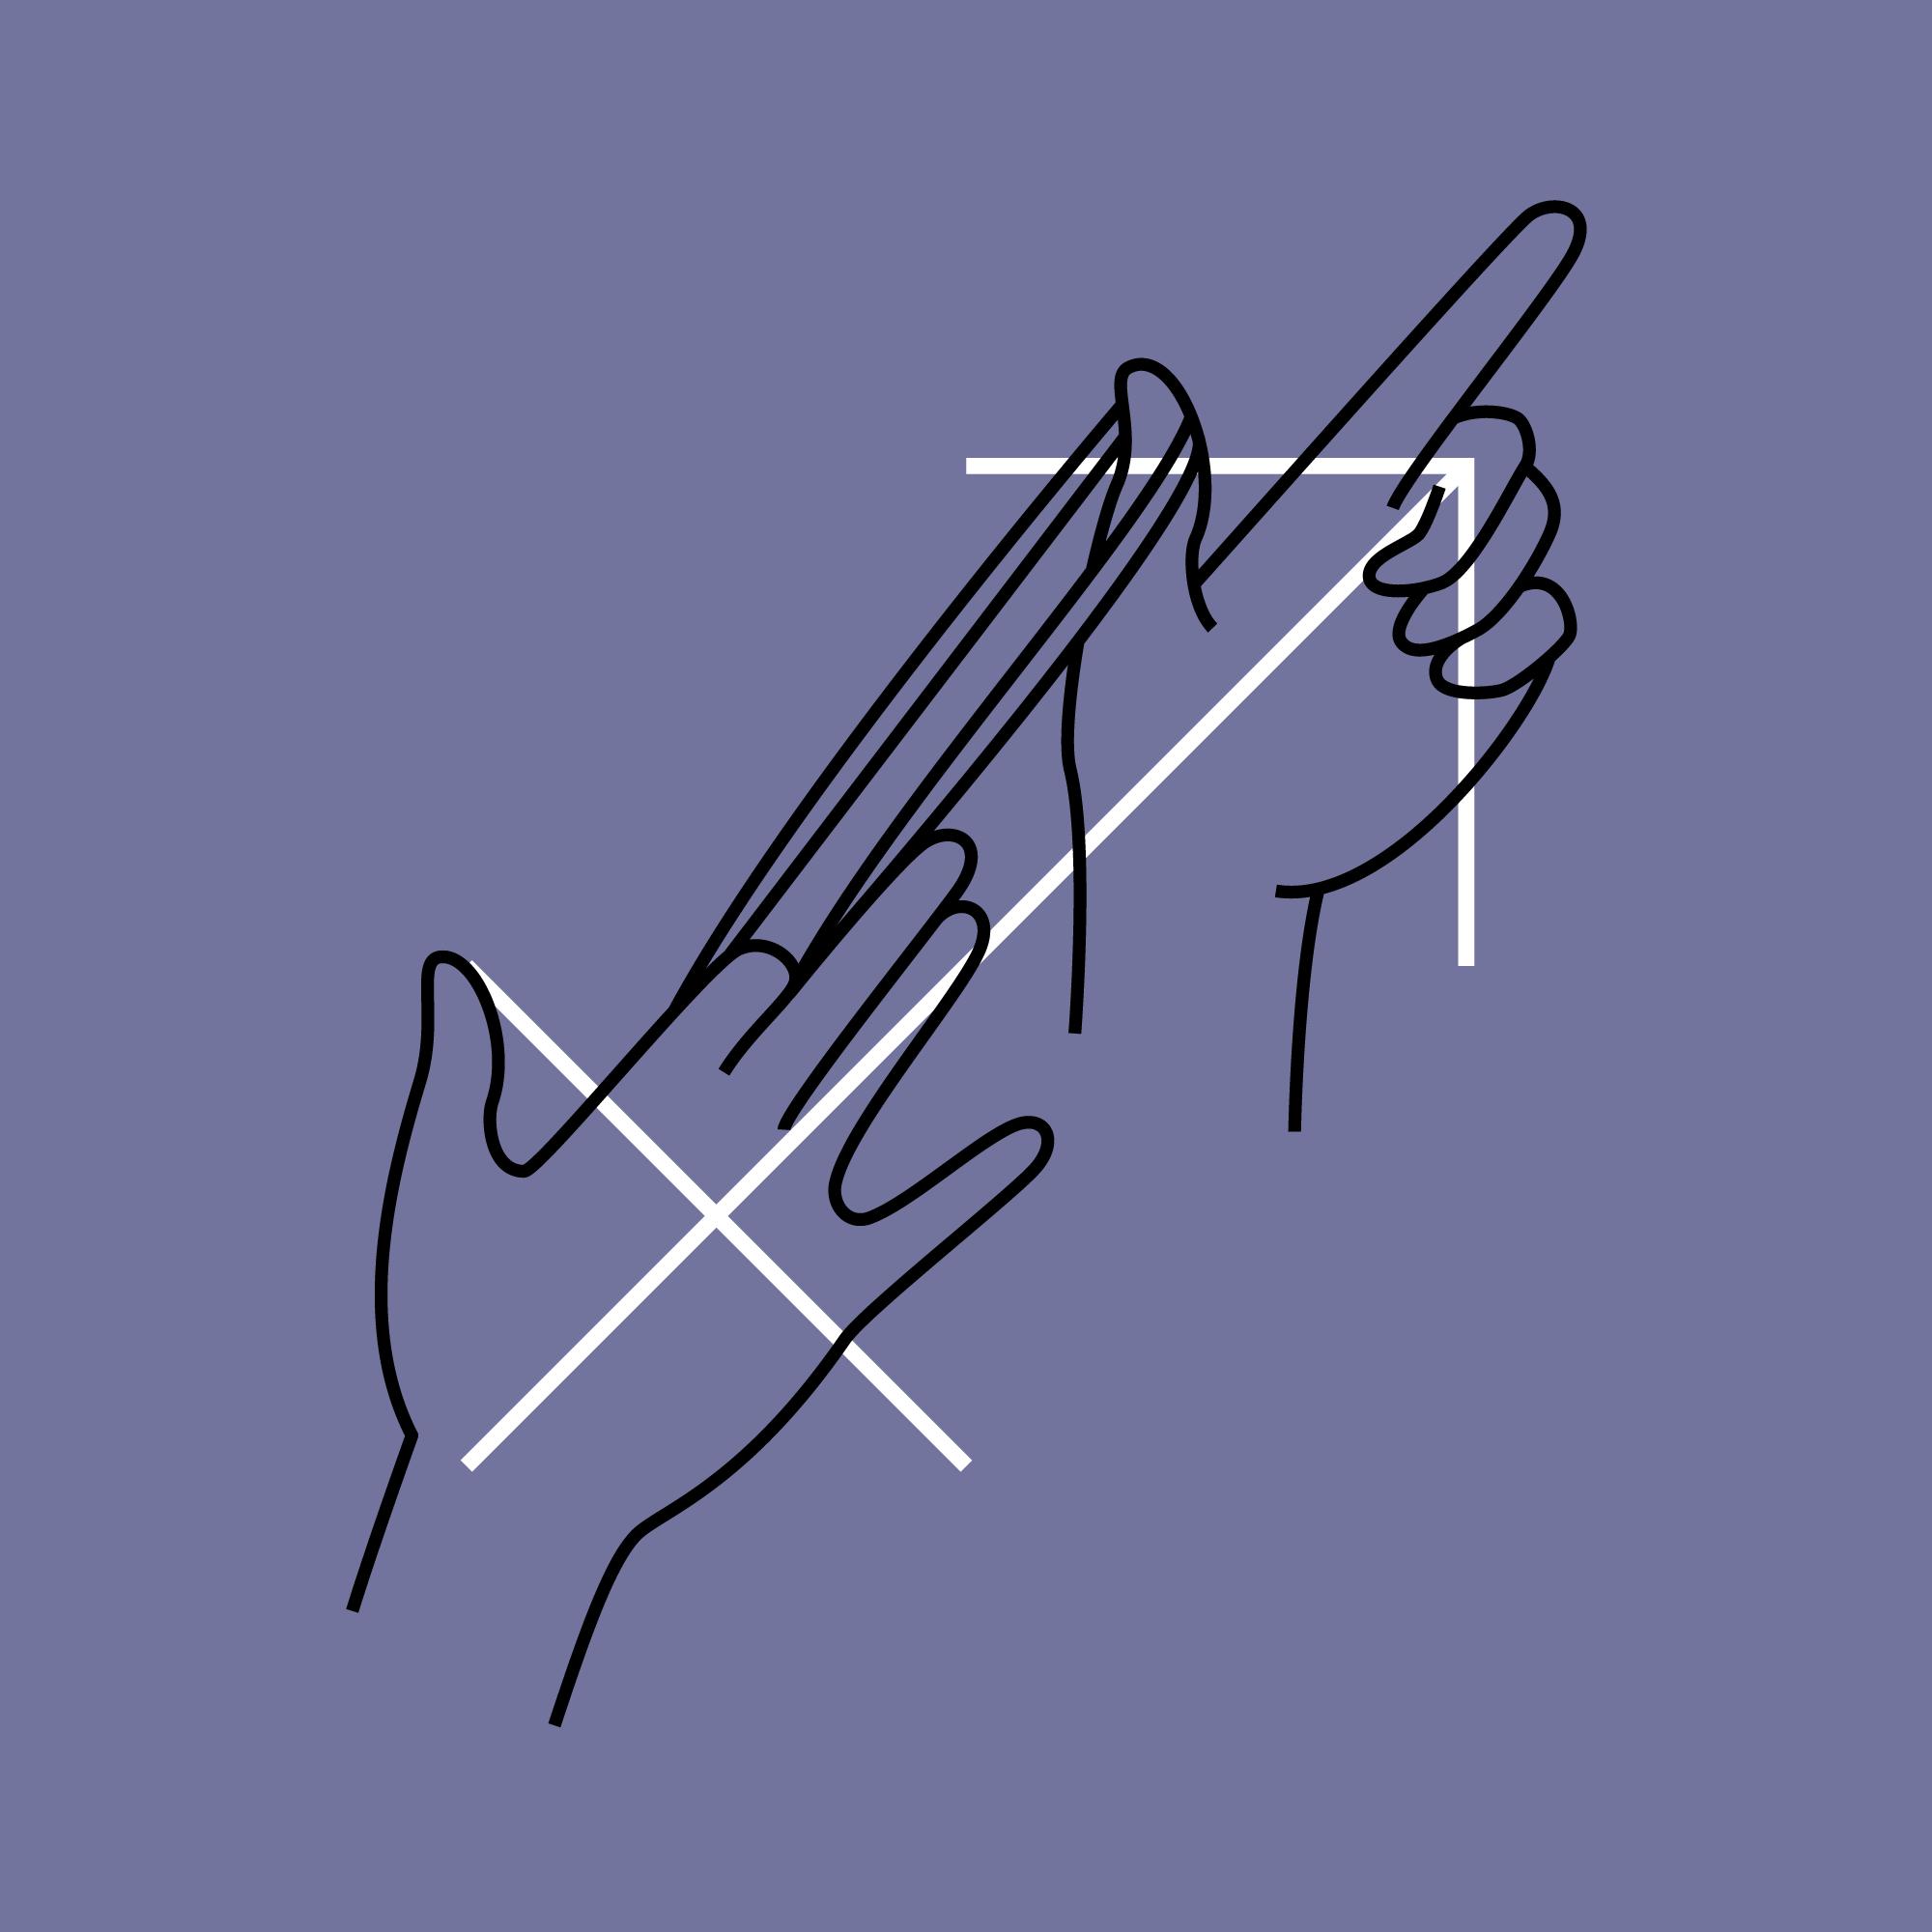 09-sagittarius.png